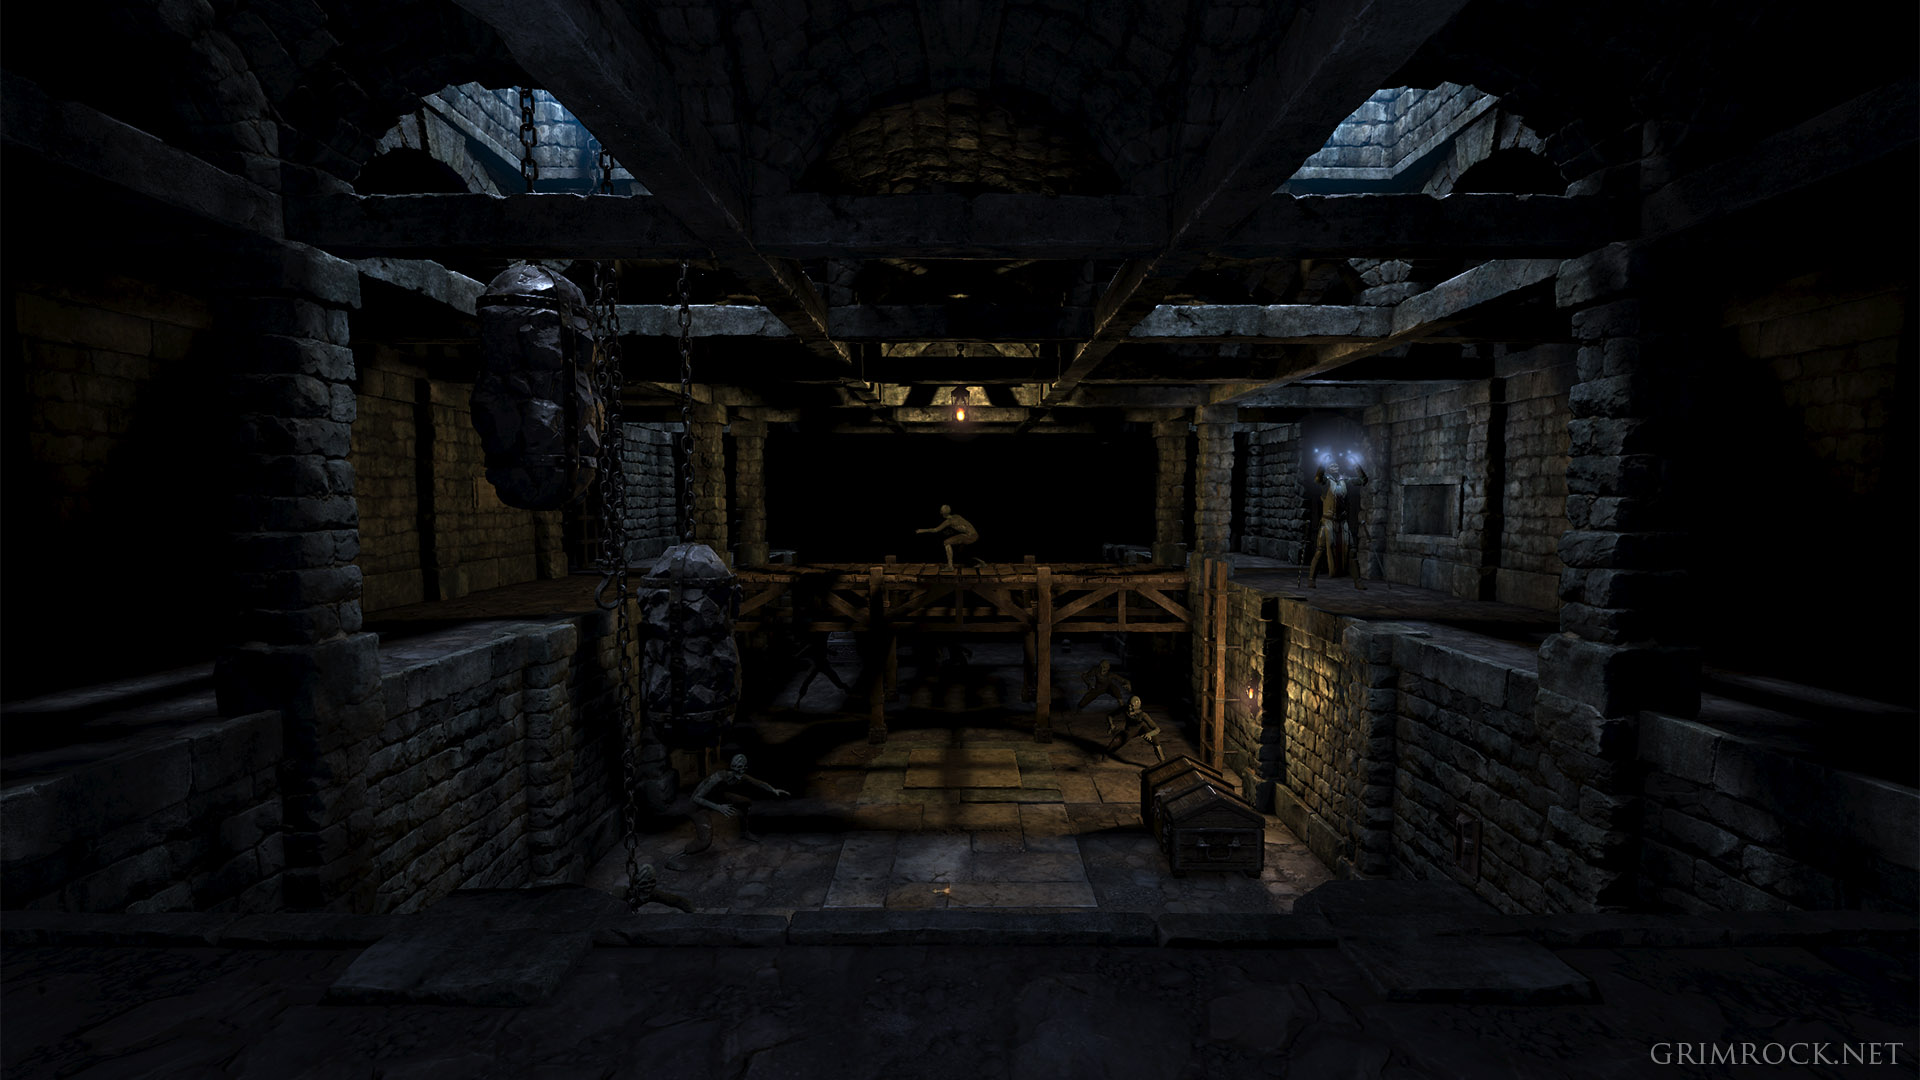 Legend of grimrock 2 promises smarter monsters more interesting puzzles grim future publicscrutiny Images